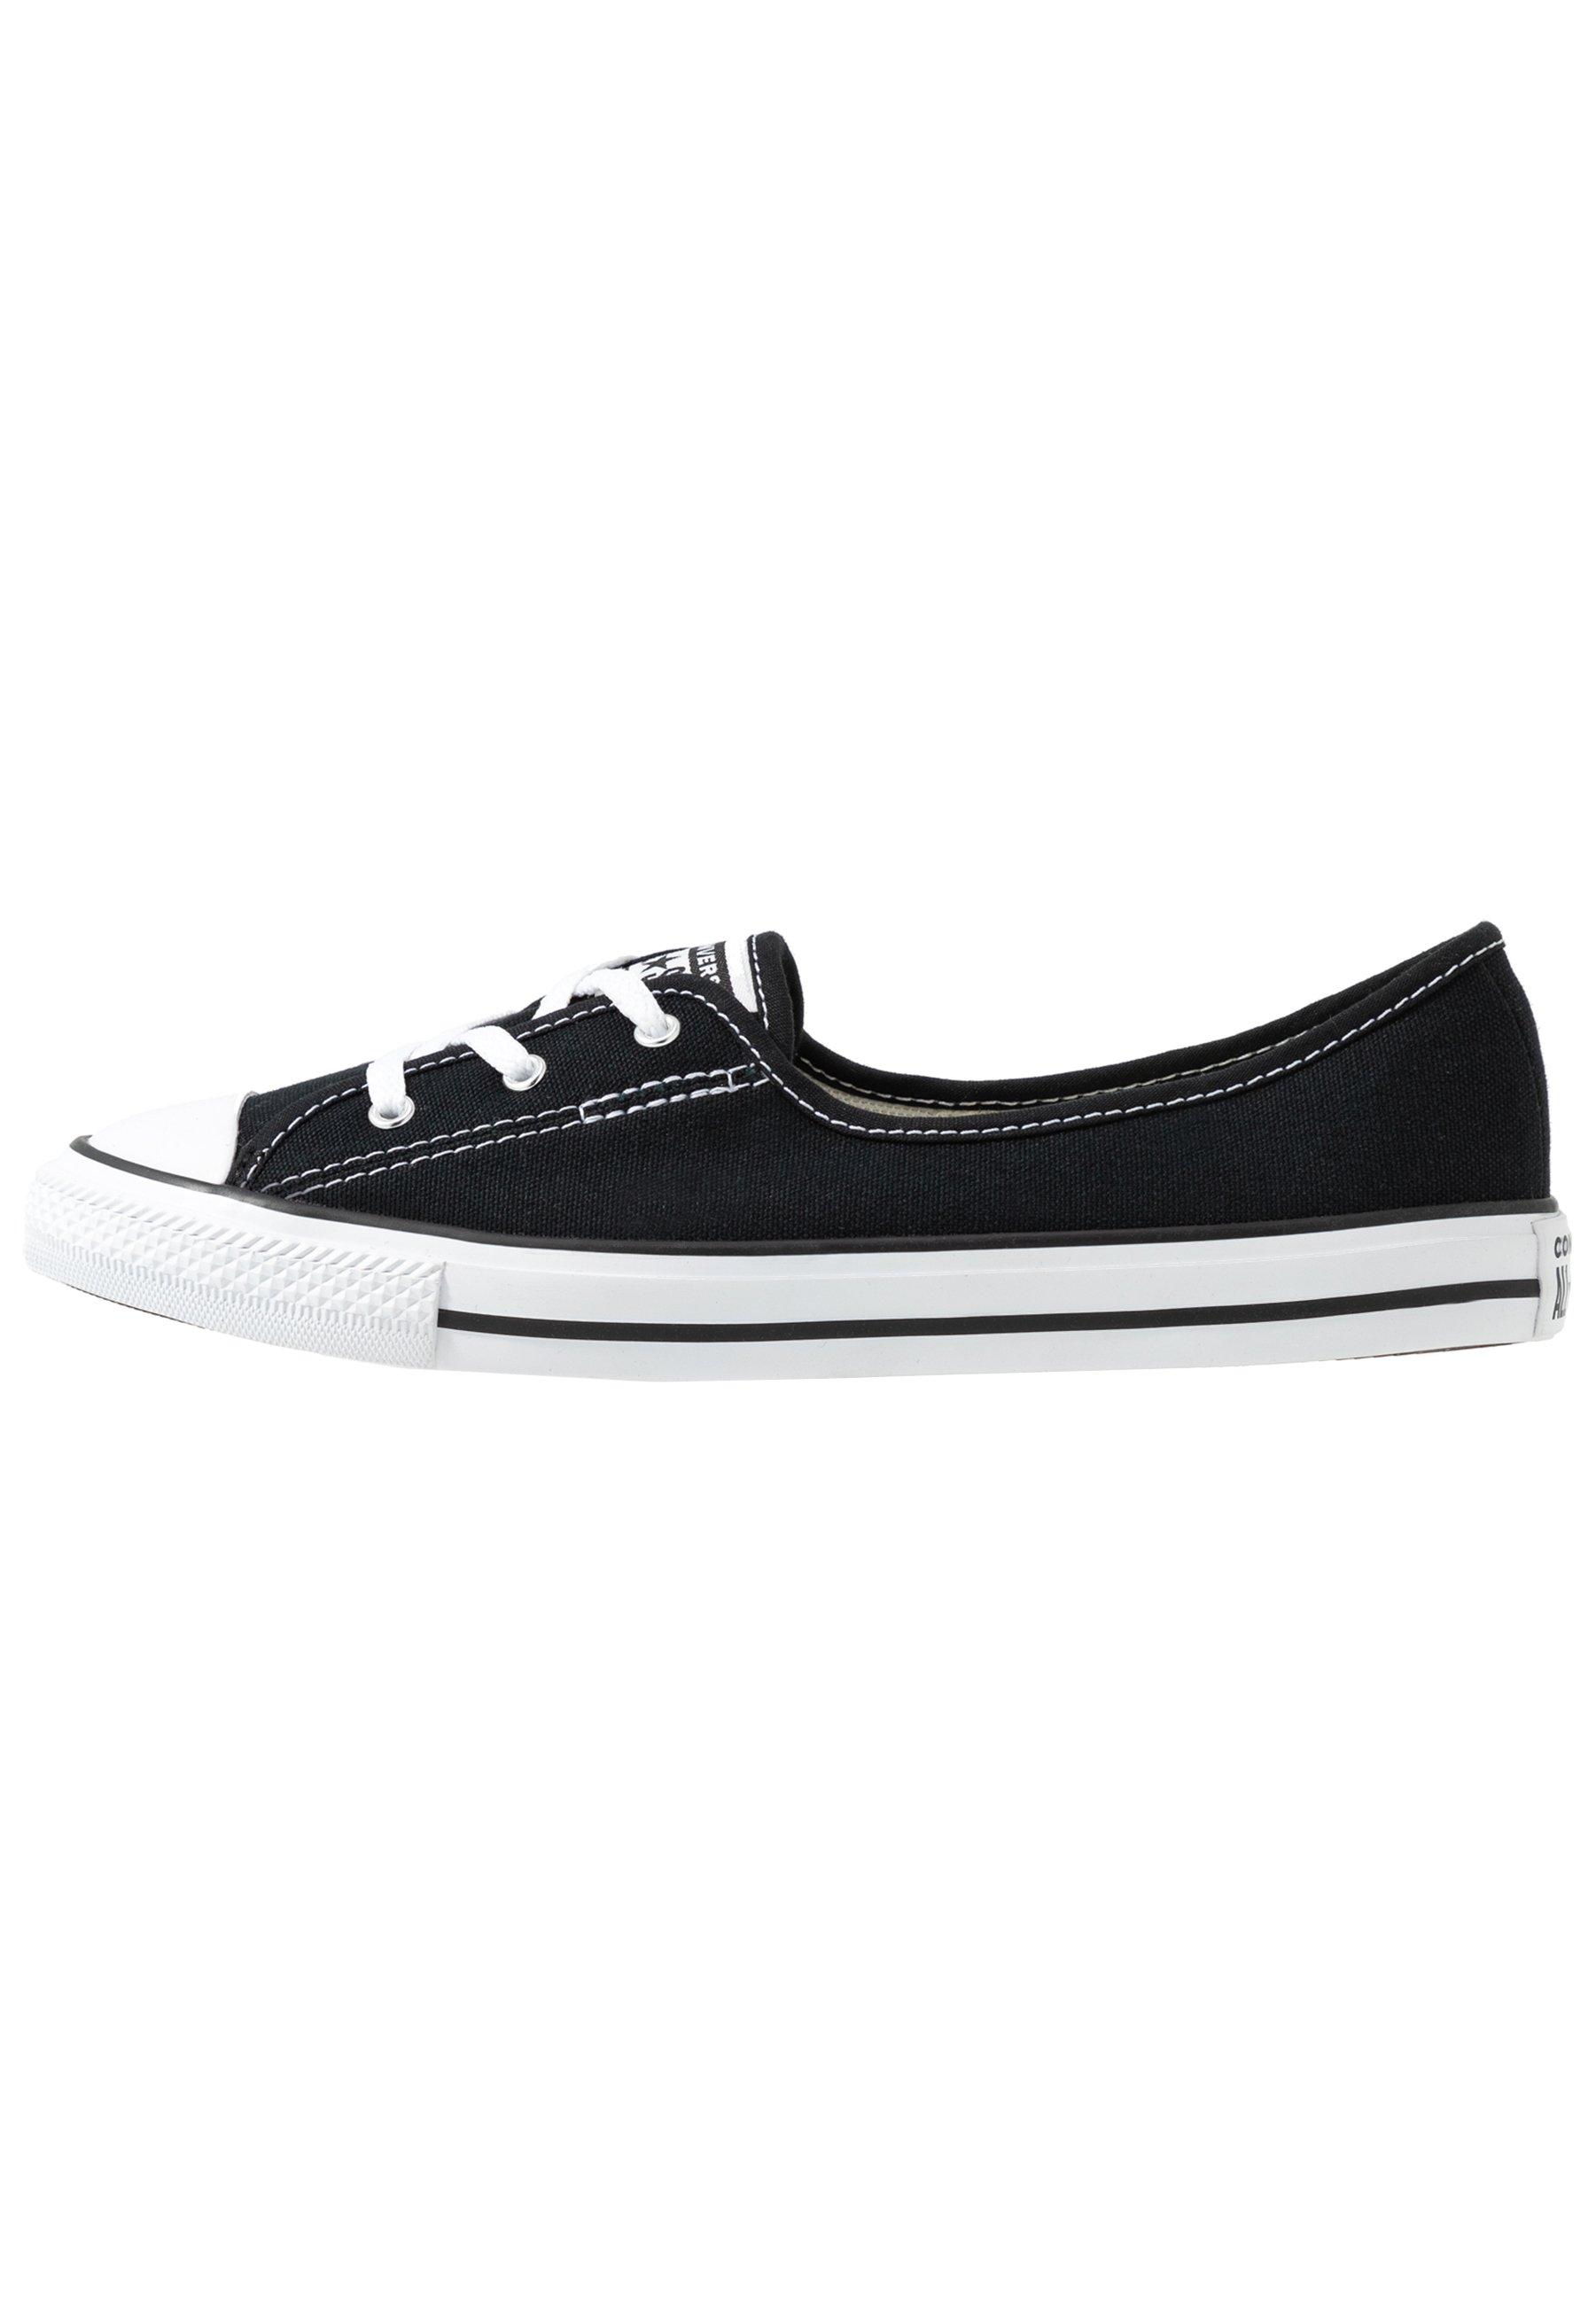 Converse CHUCK TAYLOR ALL STAR BALLET LACE - Półbuty wsuwane - black/white